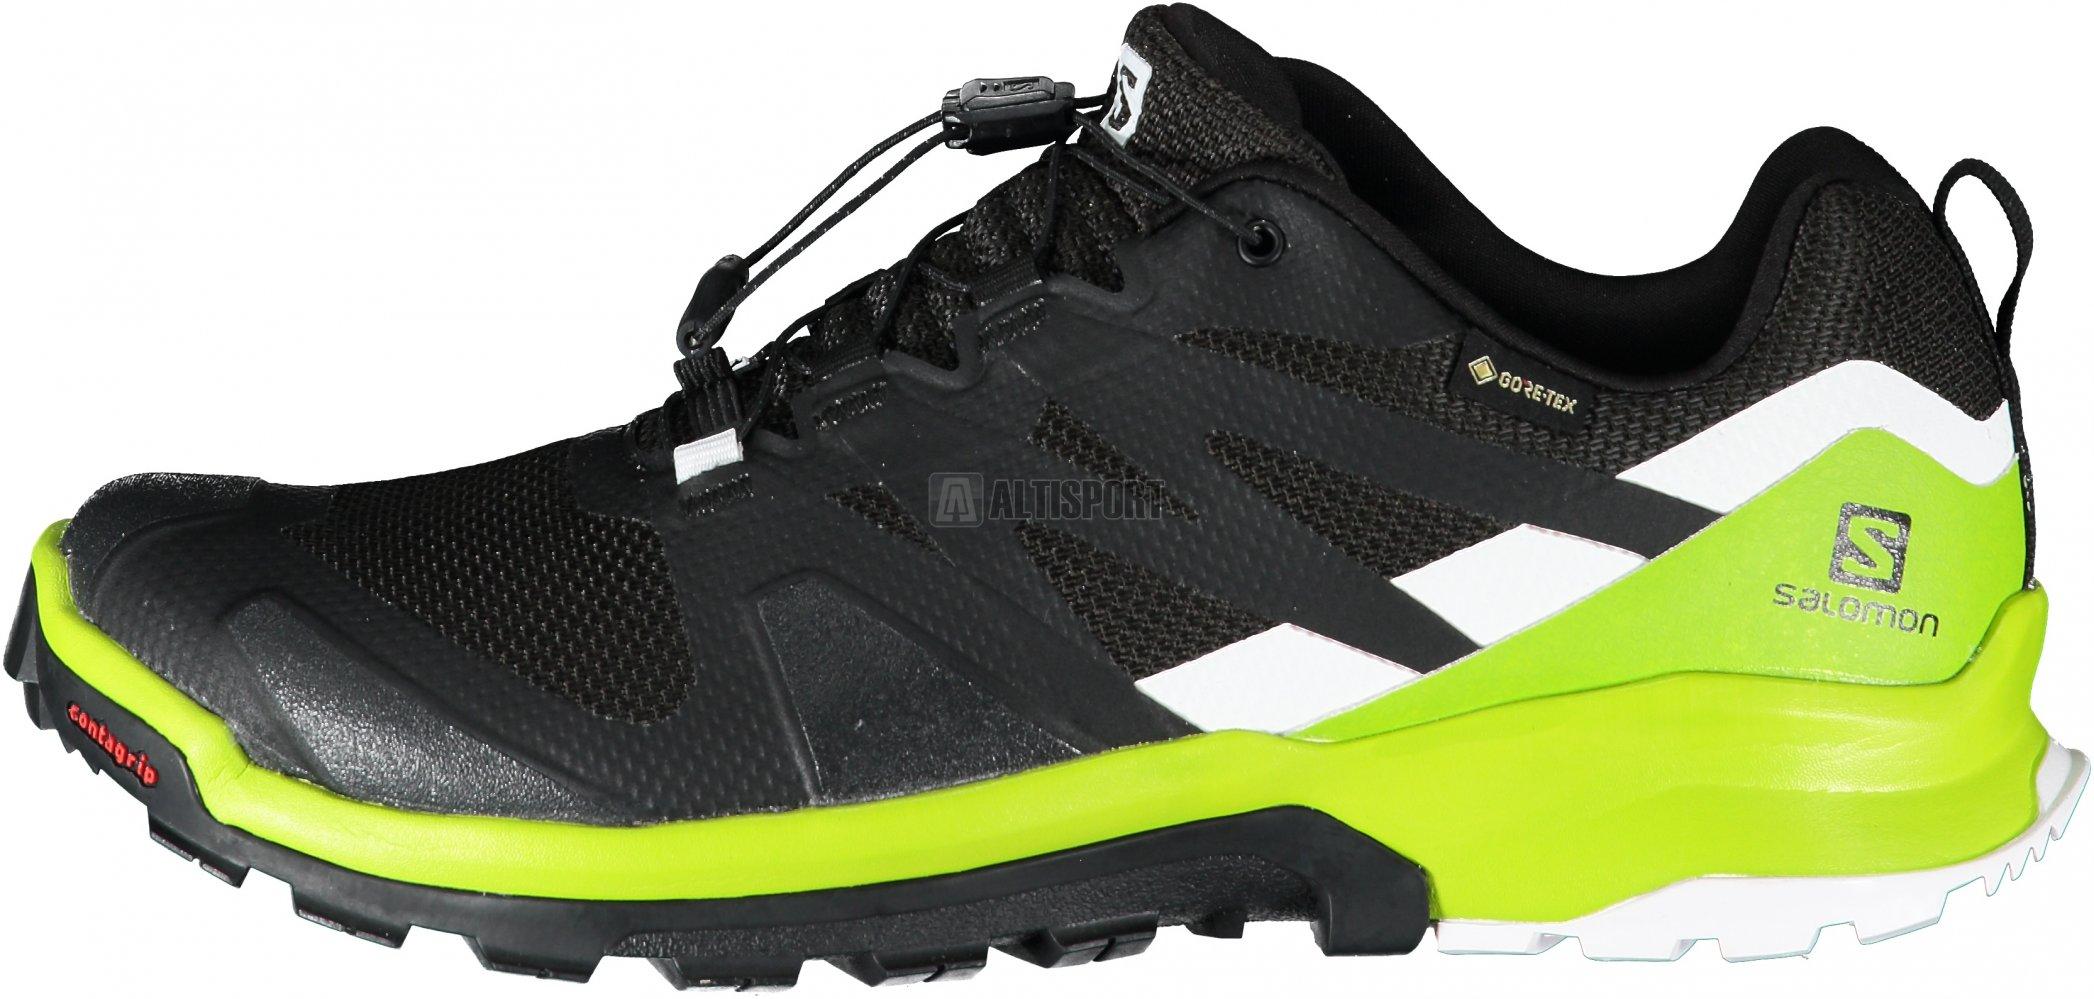 Salomon XA Rogg GTX Herren L41121900 phantom//lime green *UVP 129,99